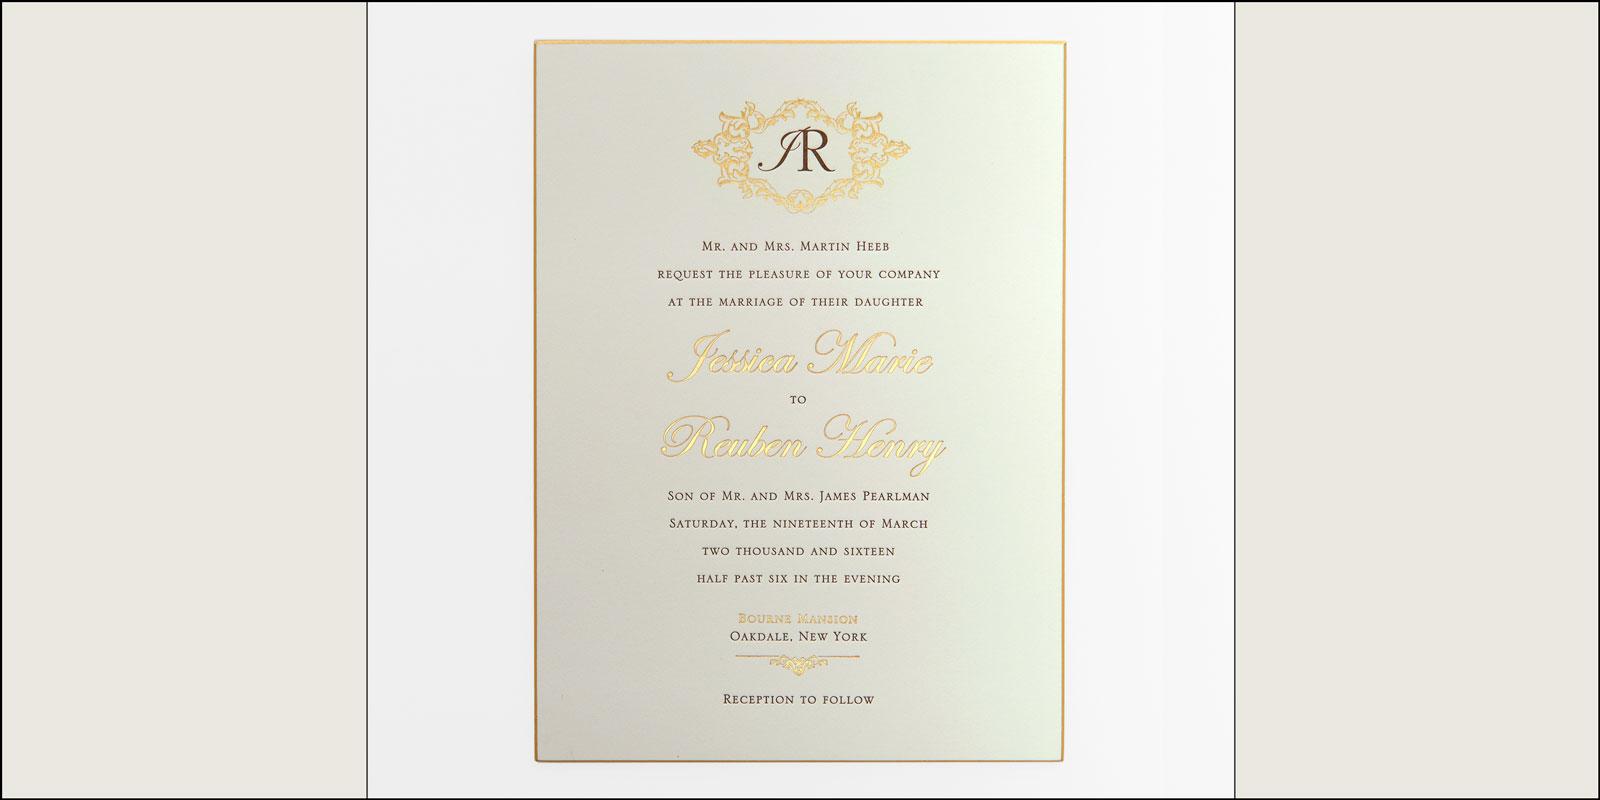 Jessica-Reuben-Invitation-6